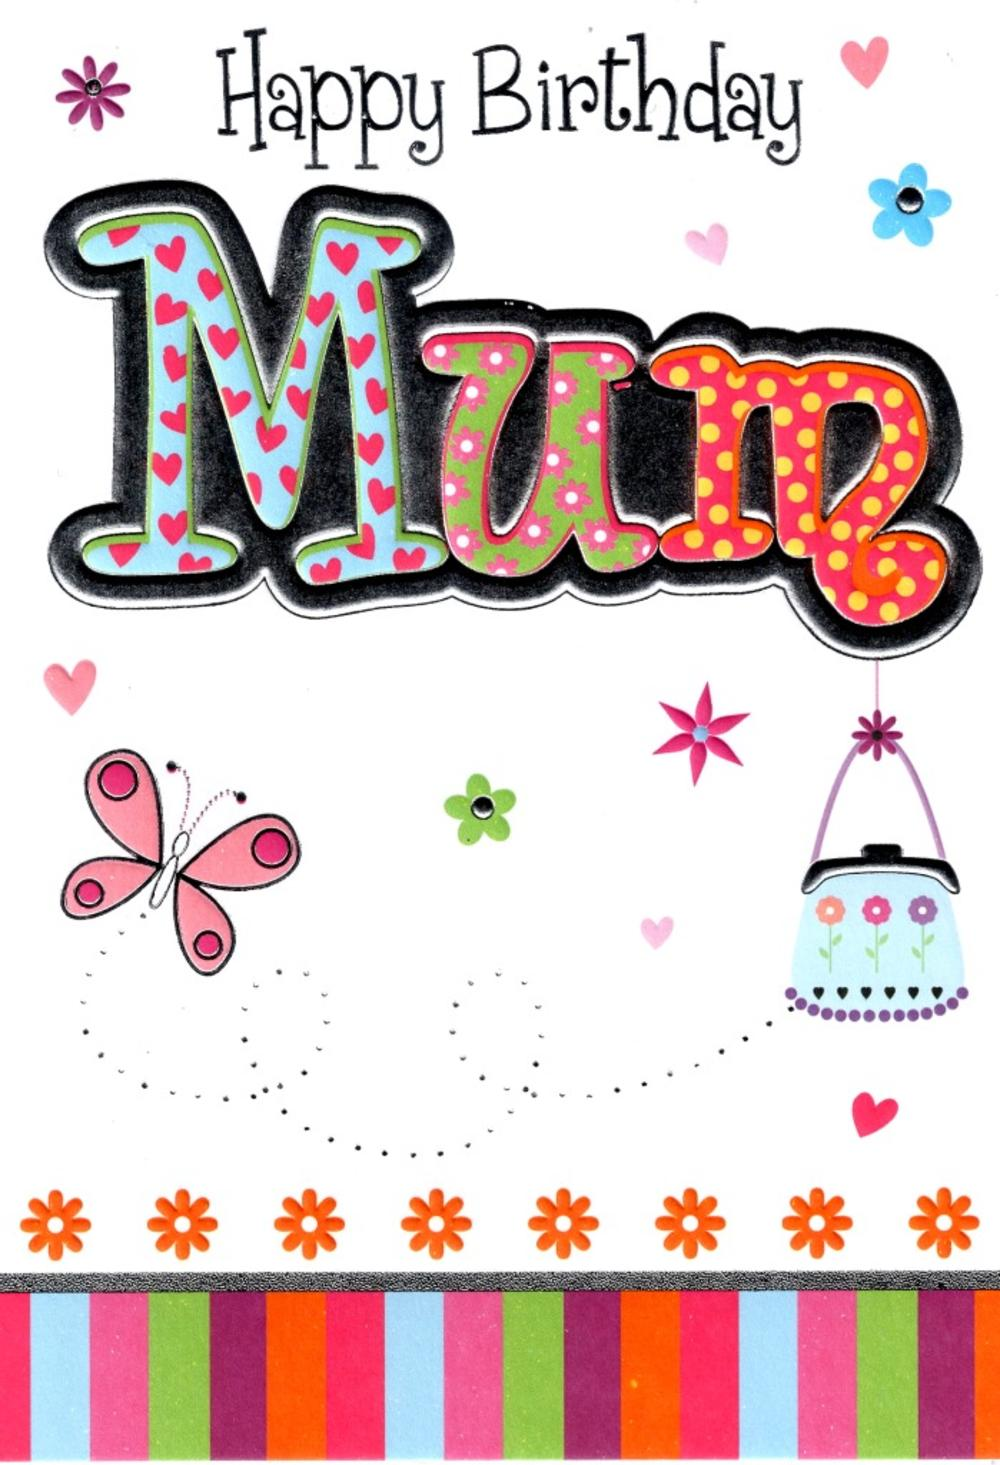 Mum Lovely Birthday Card